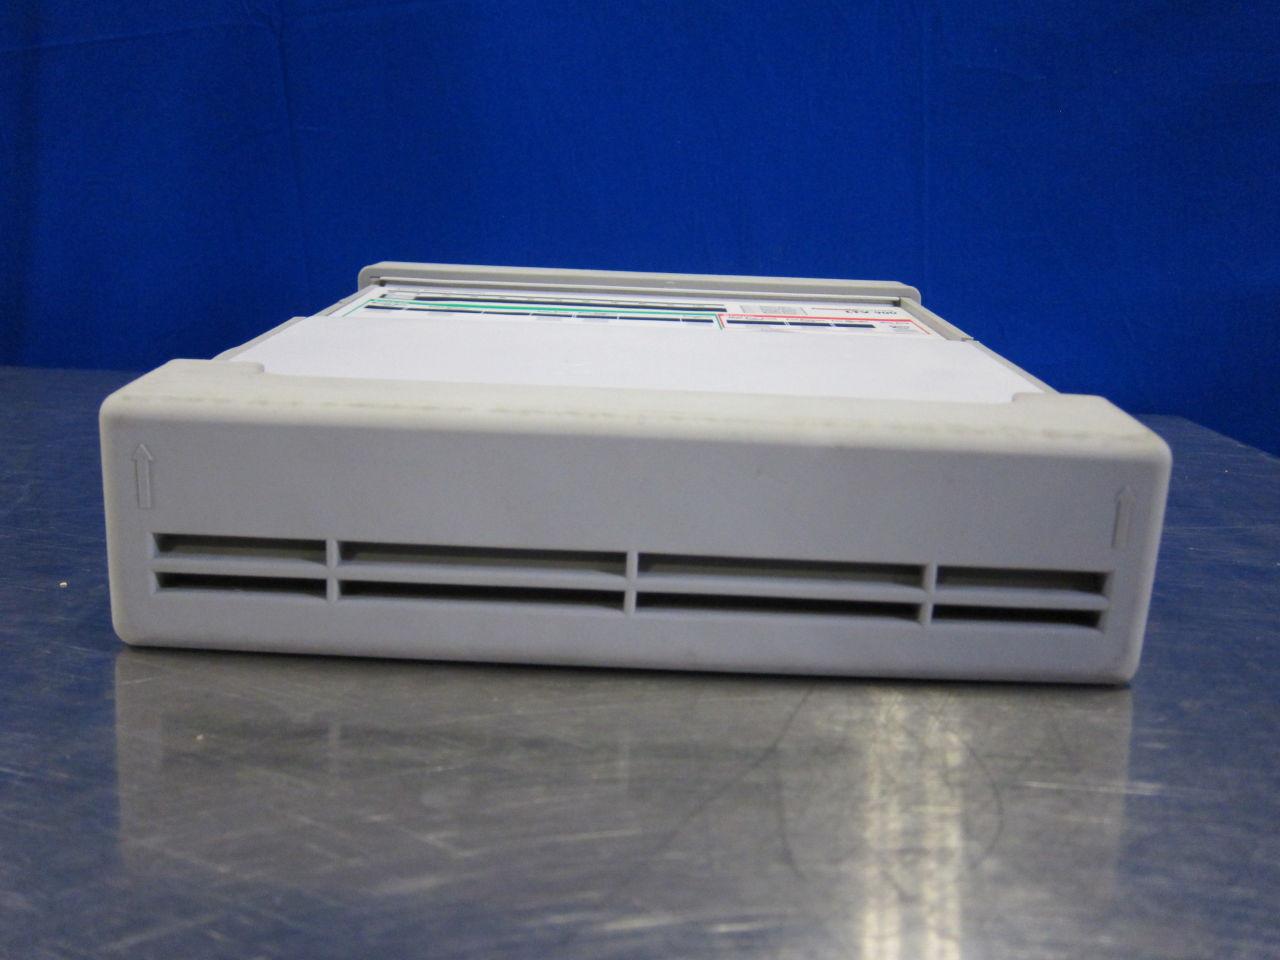 PULMONETIC SYSTEMS LTV950/900  - Lot of 2 Ventilator